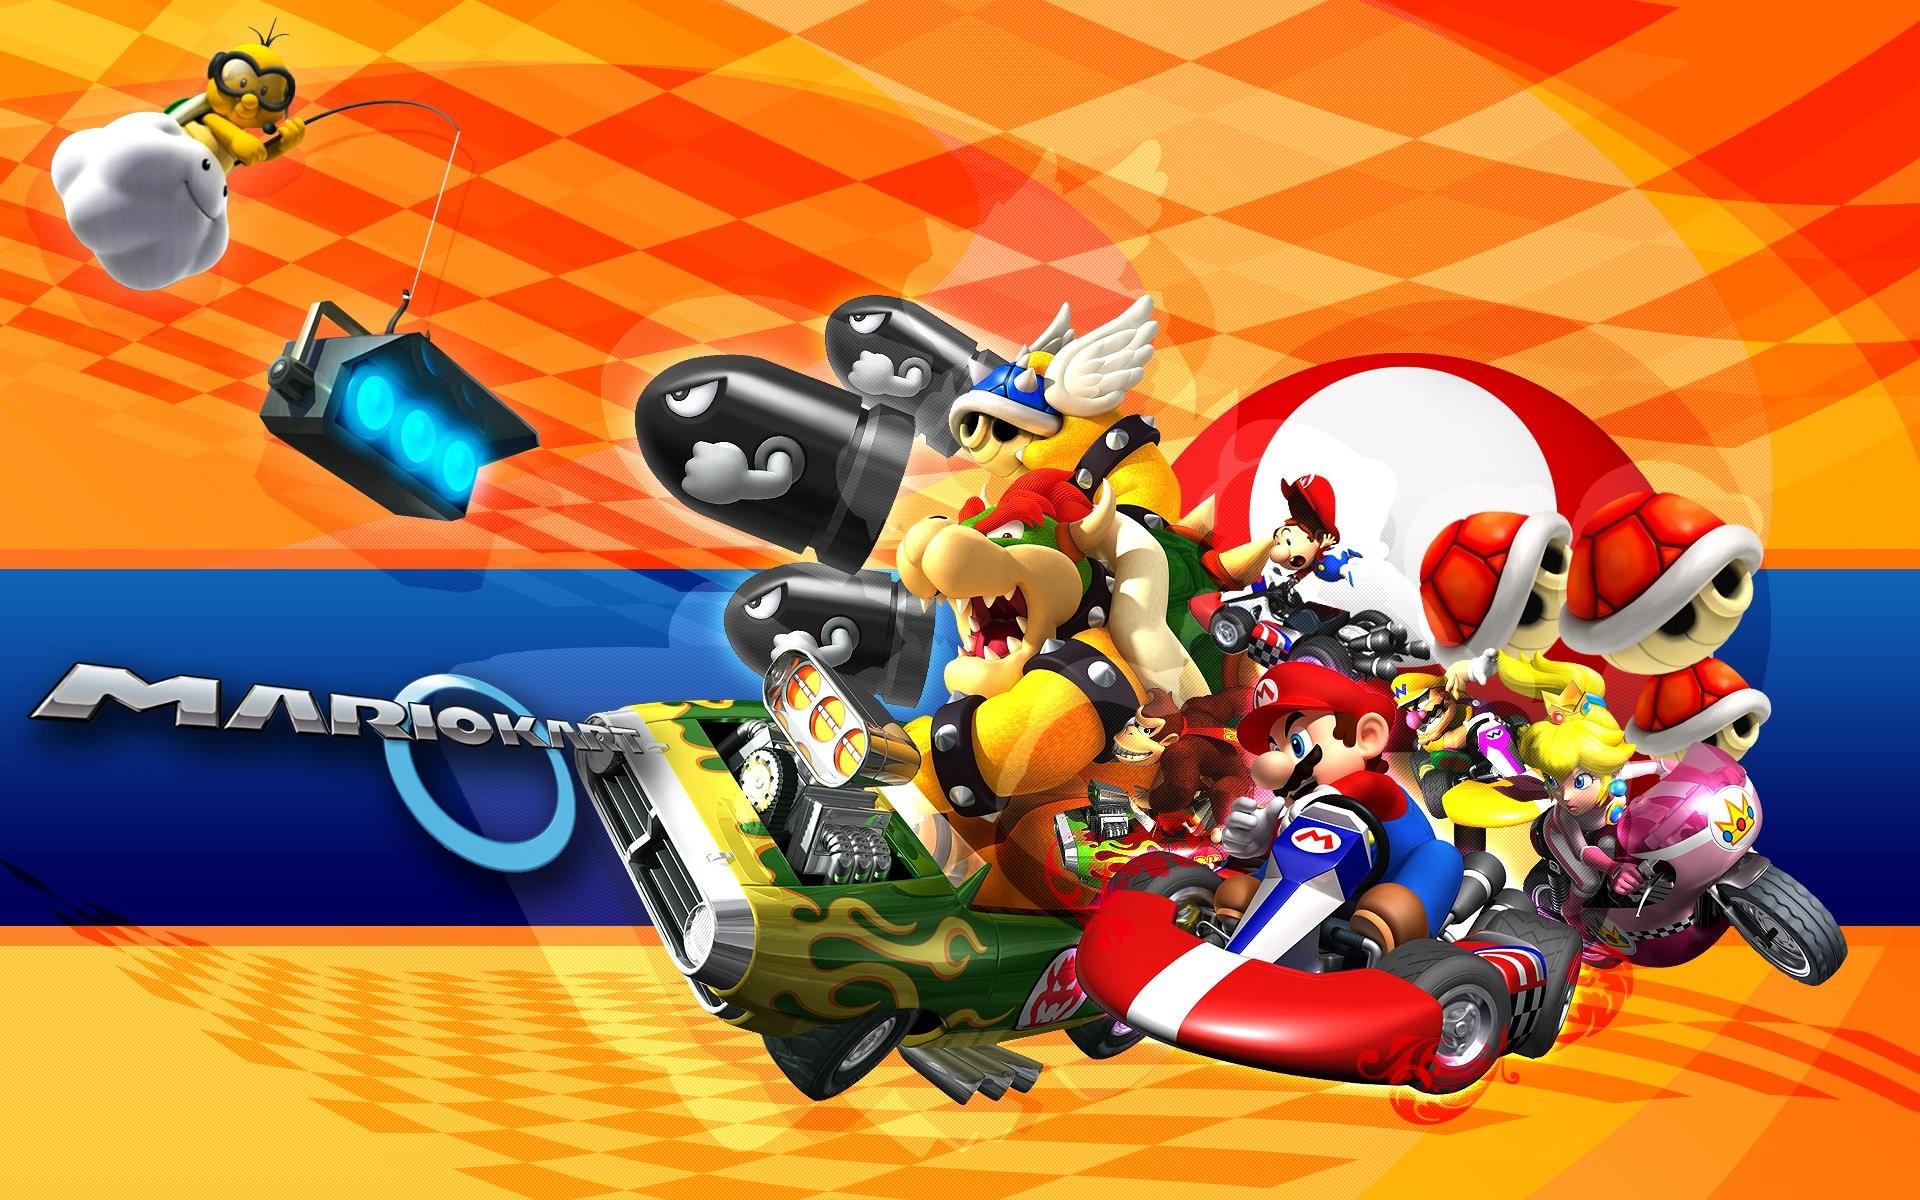 Mario Kart Wii Wallpaper Wallpapertag